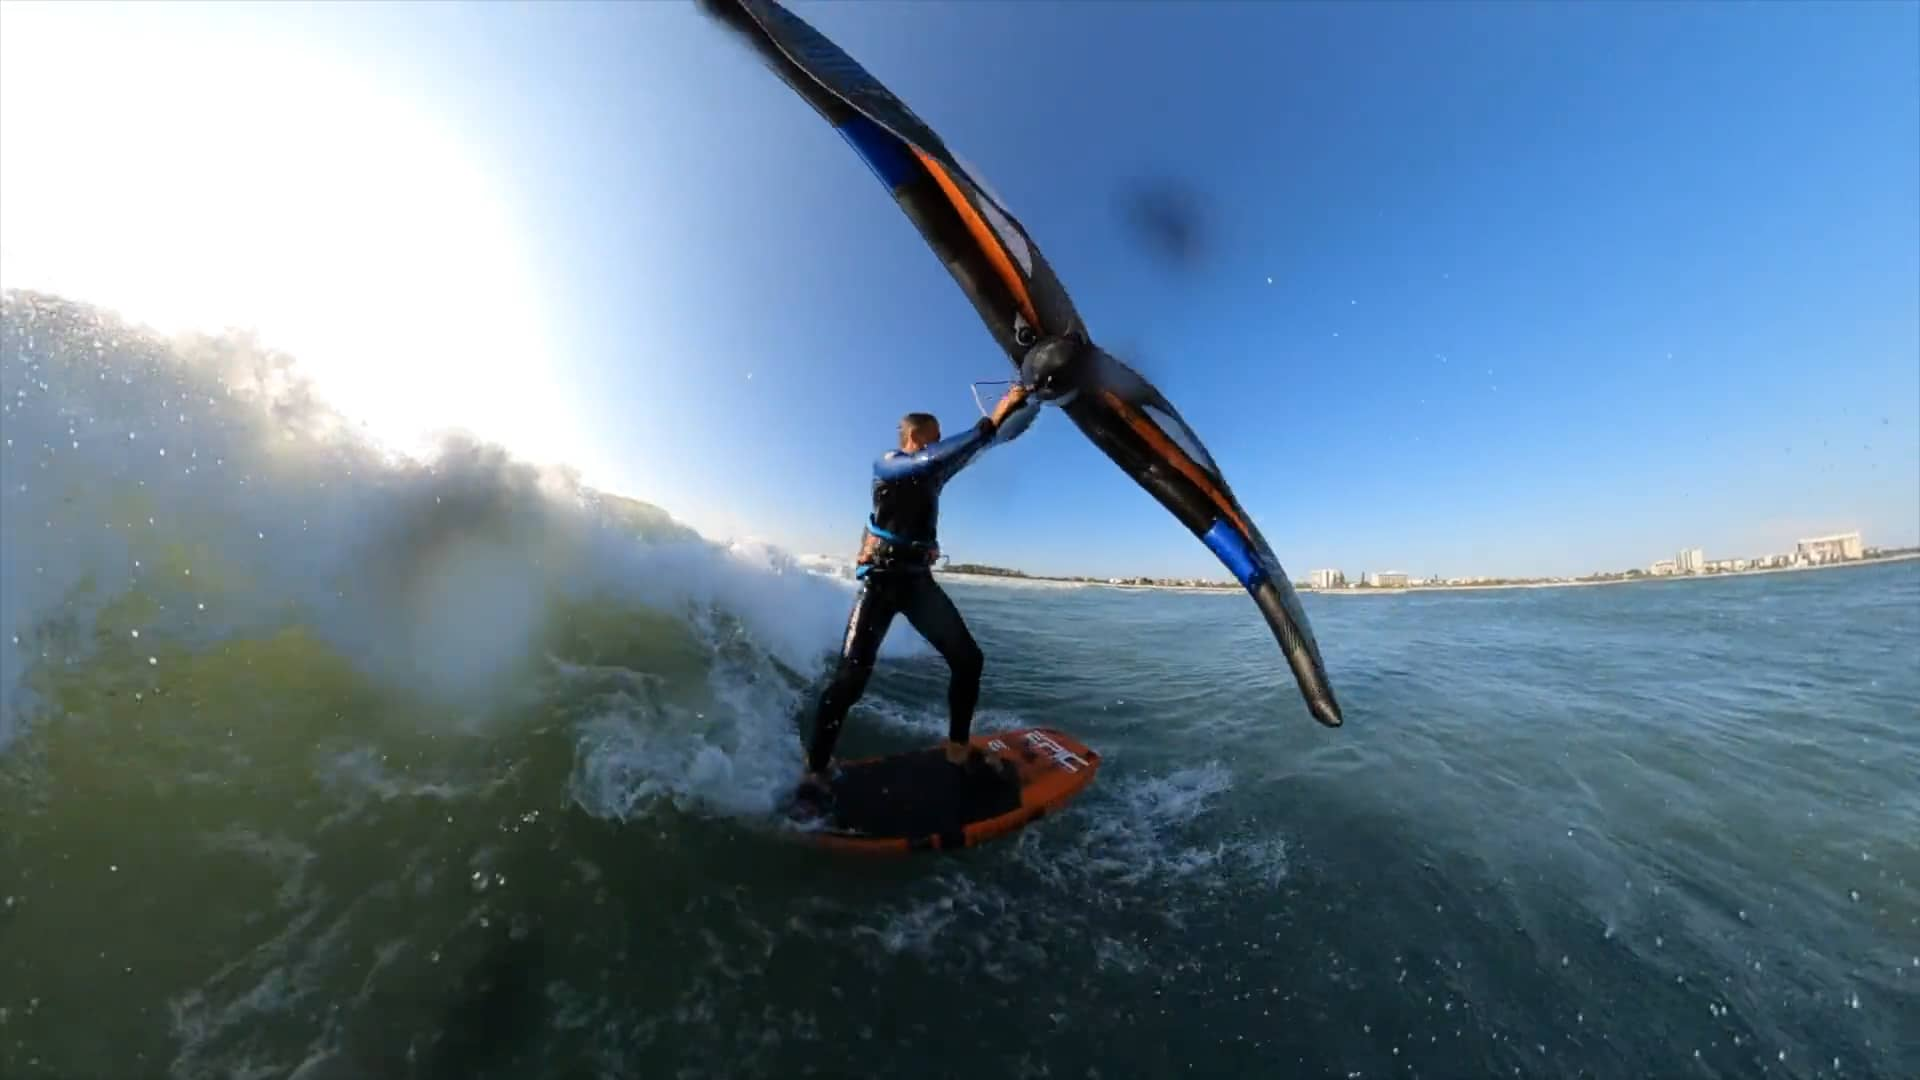 EPICWING sun set session - with Epic Kites Kiteboarding